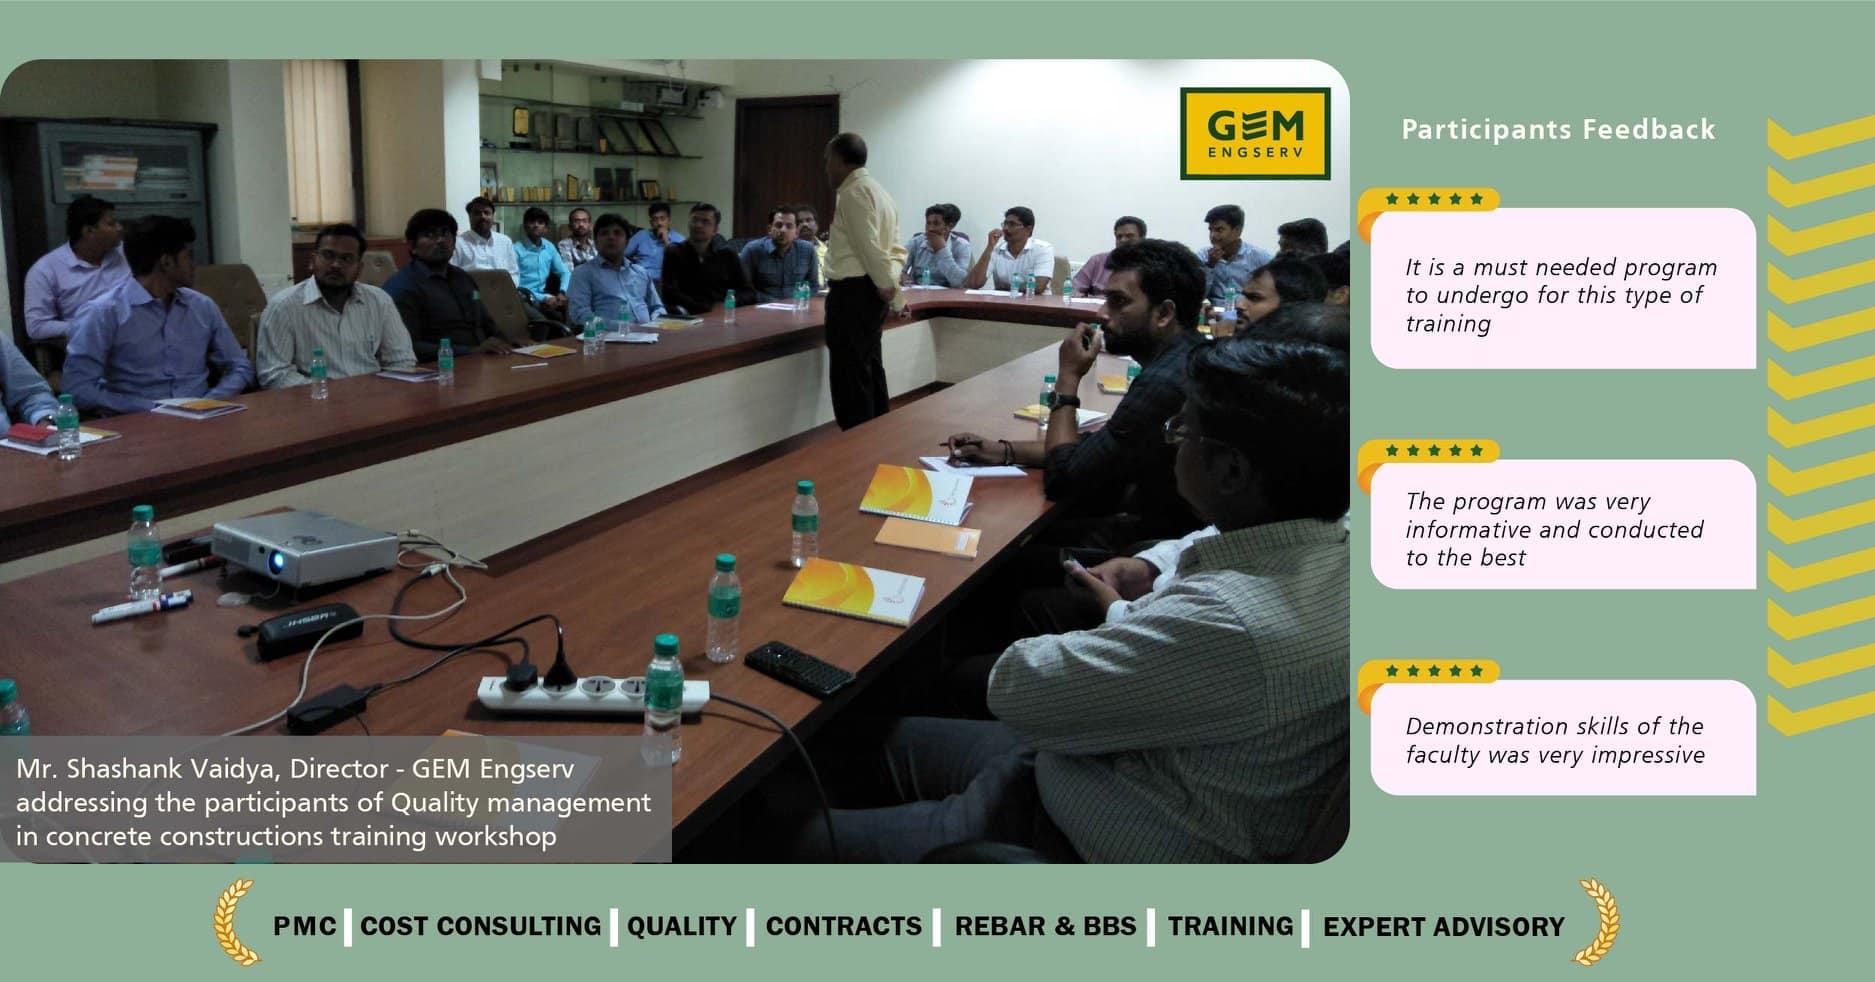 Quality Management in Concrete Constructions workshop